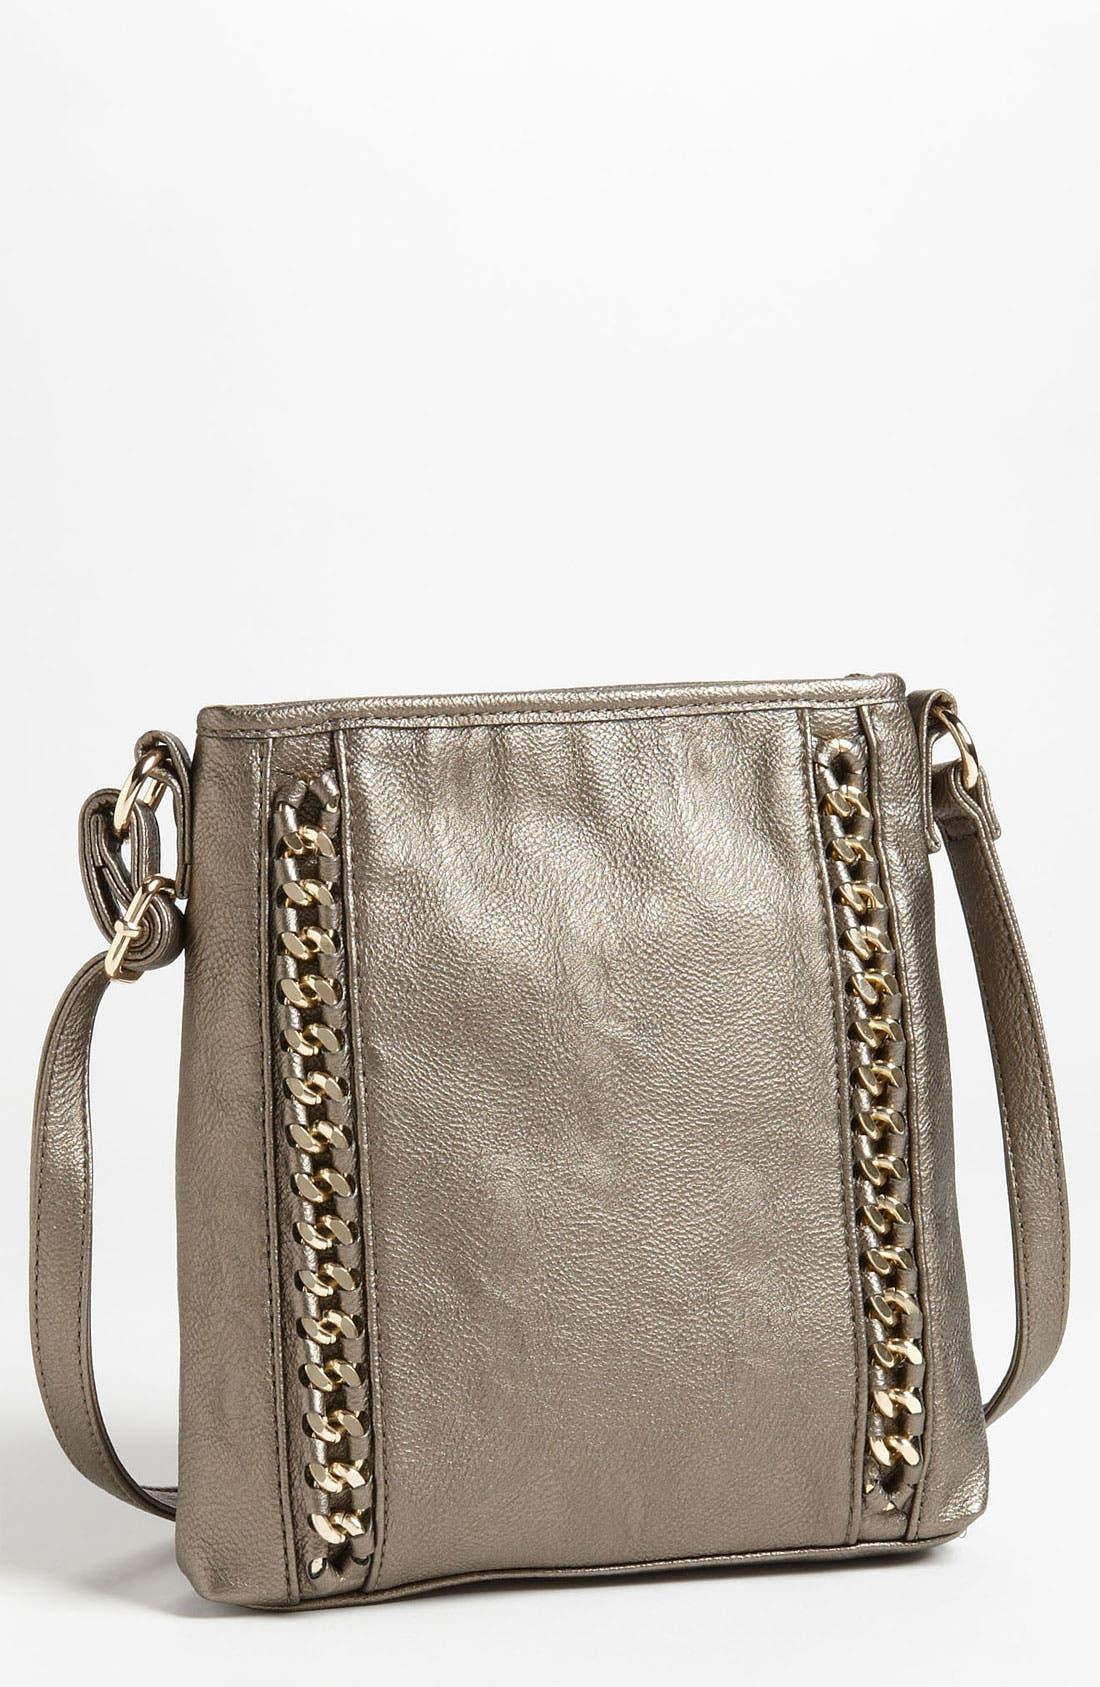 Main Image - LaTique 'Lucia' Crossbody Bag